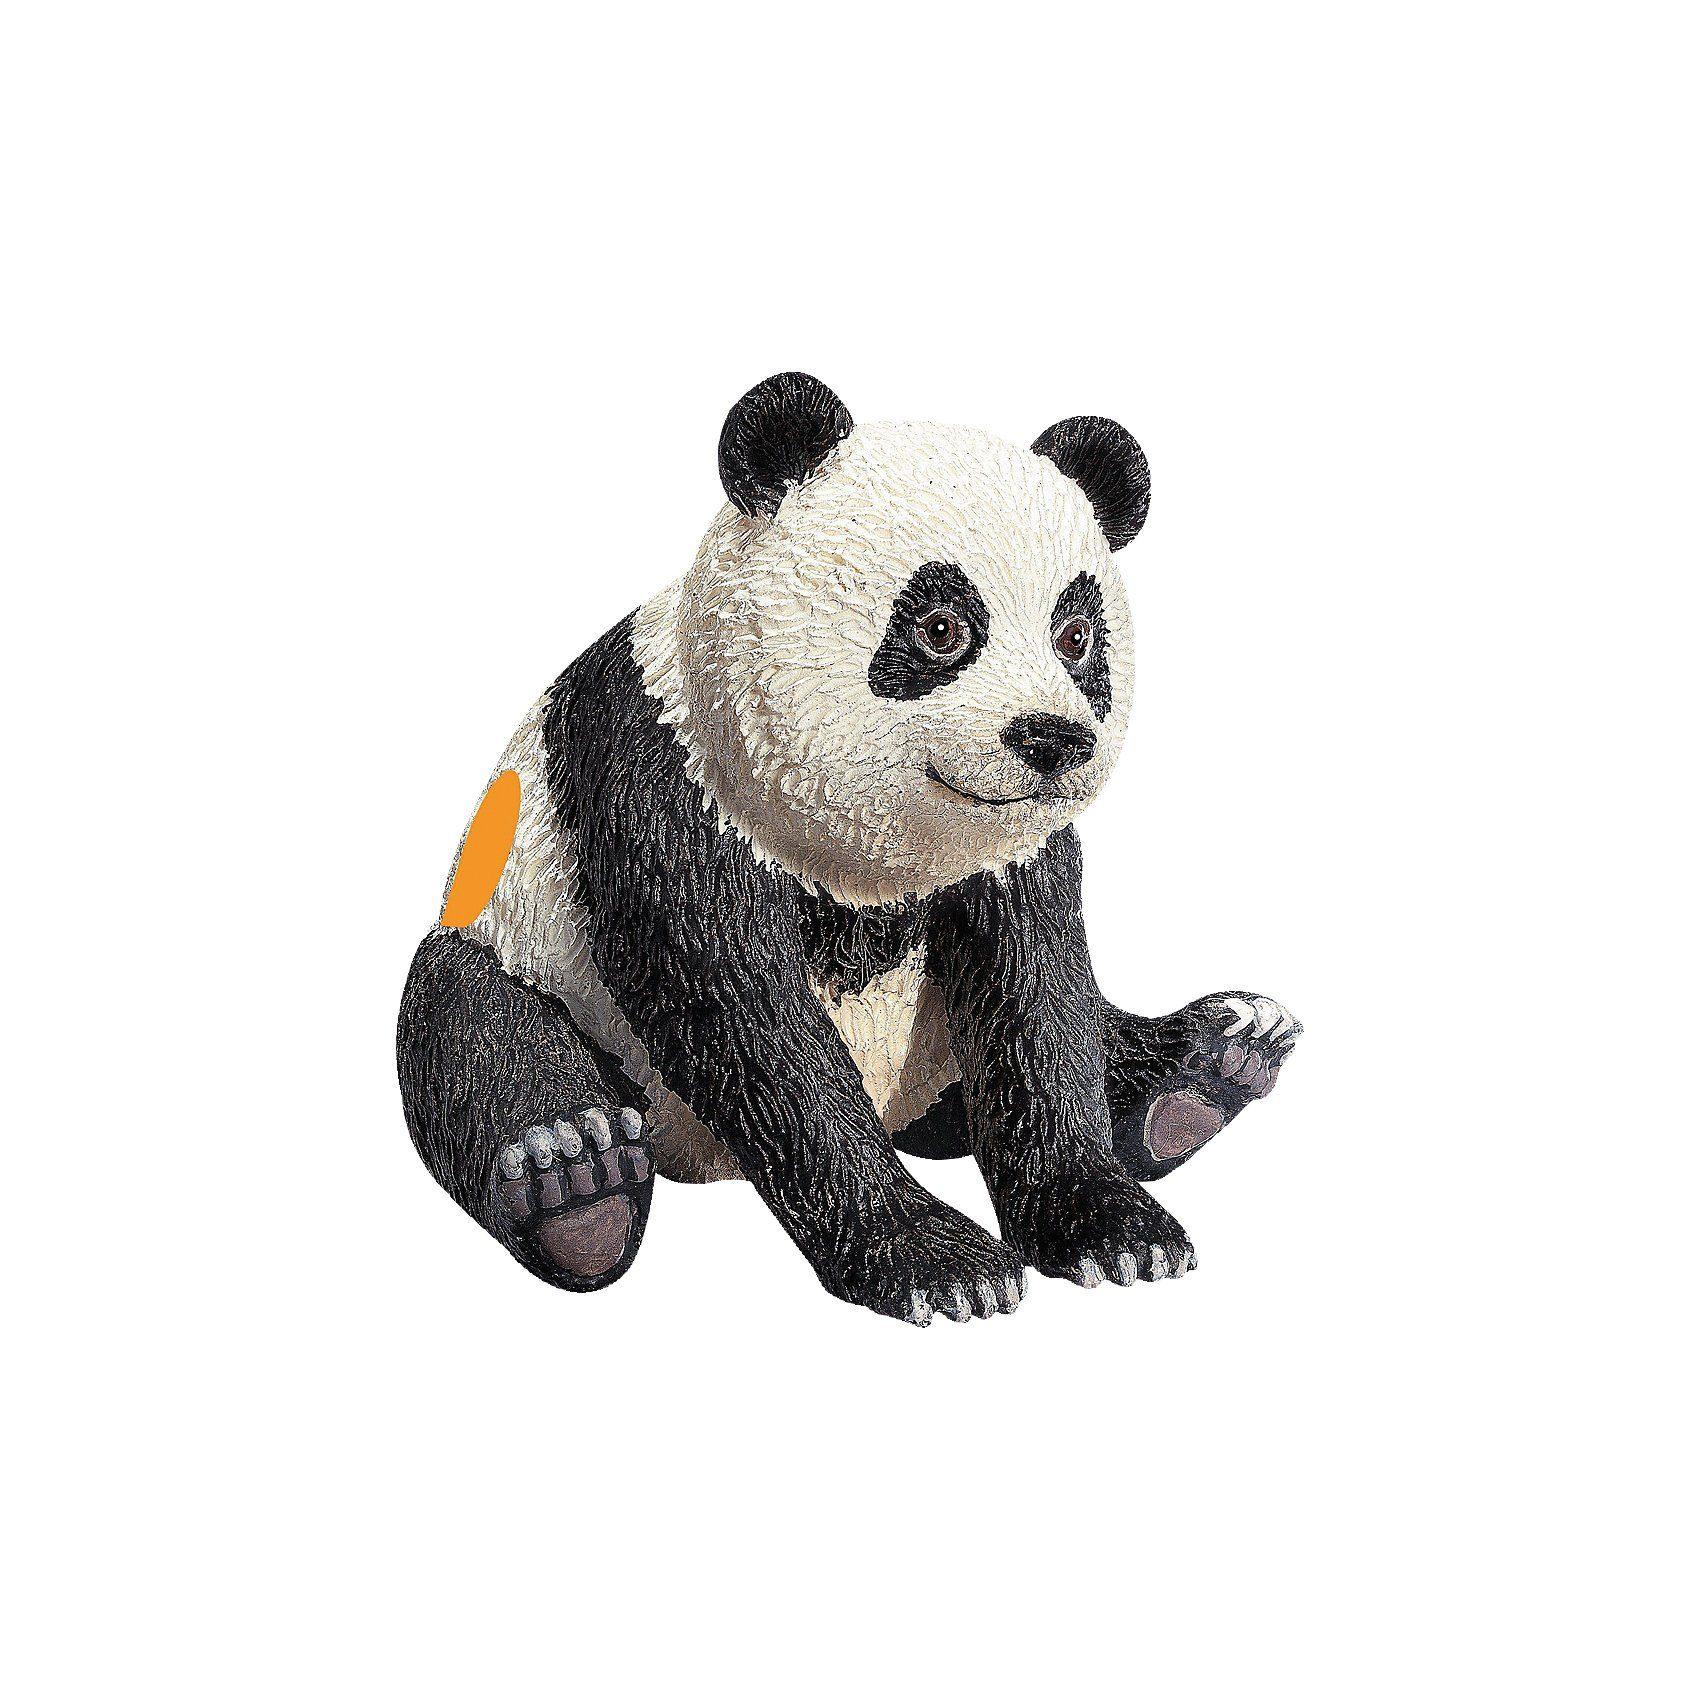 Ravensburger tiptoi® Spielfigur Großer Panda Junges